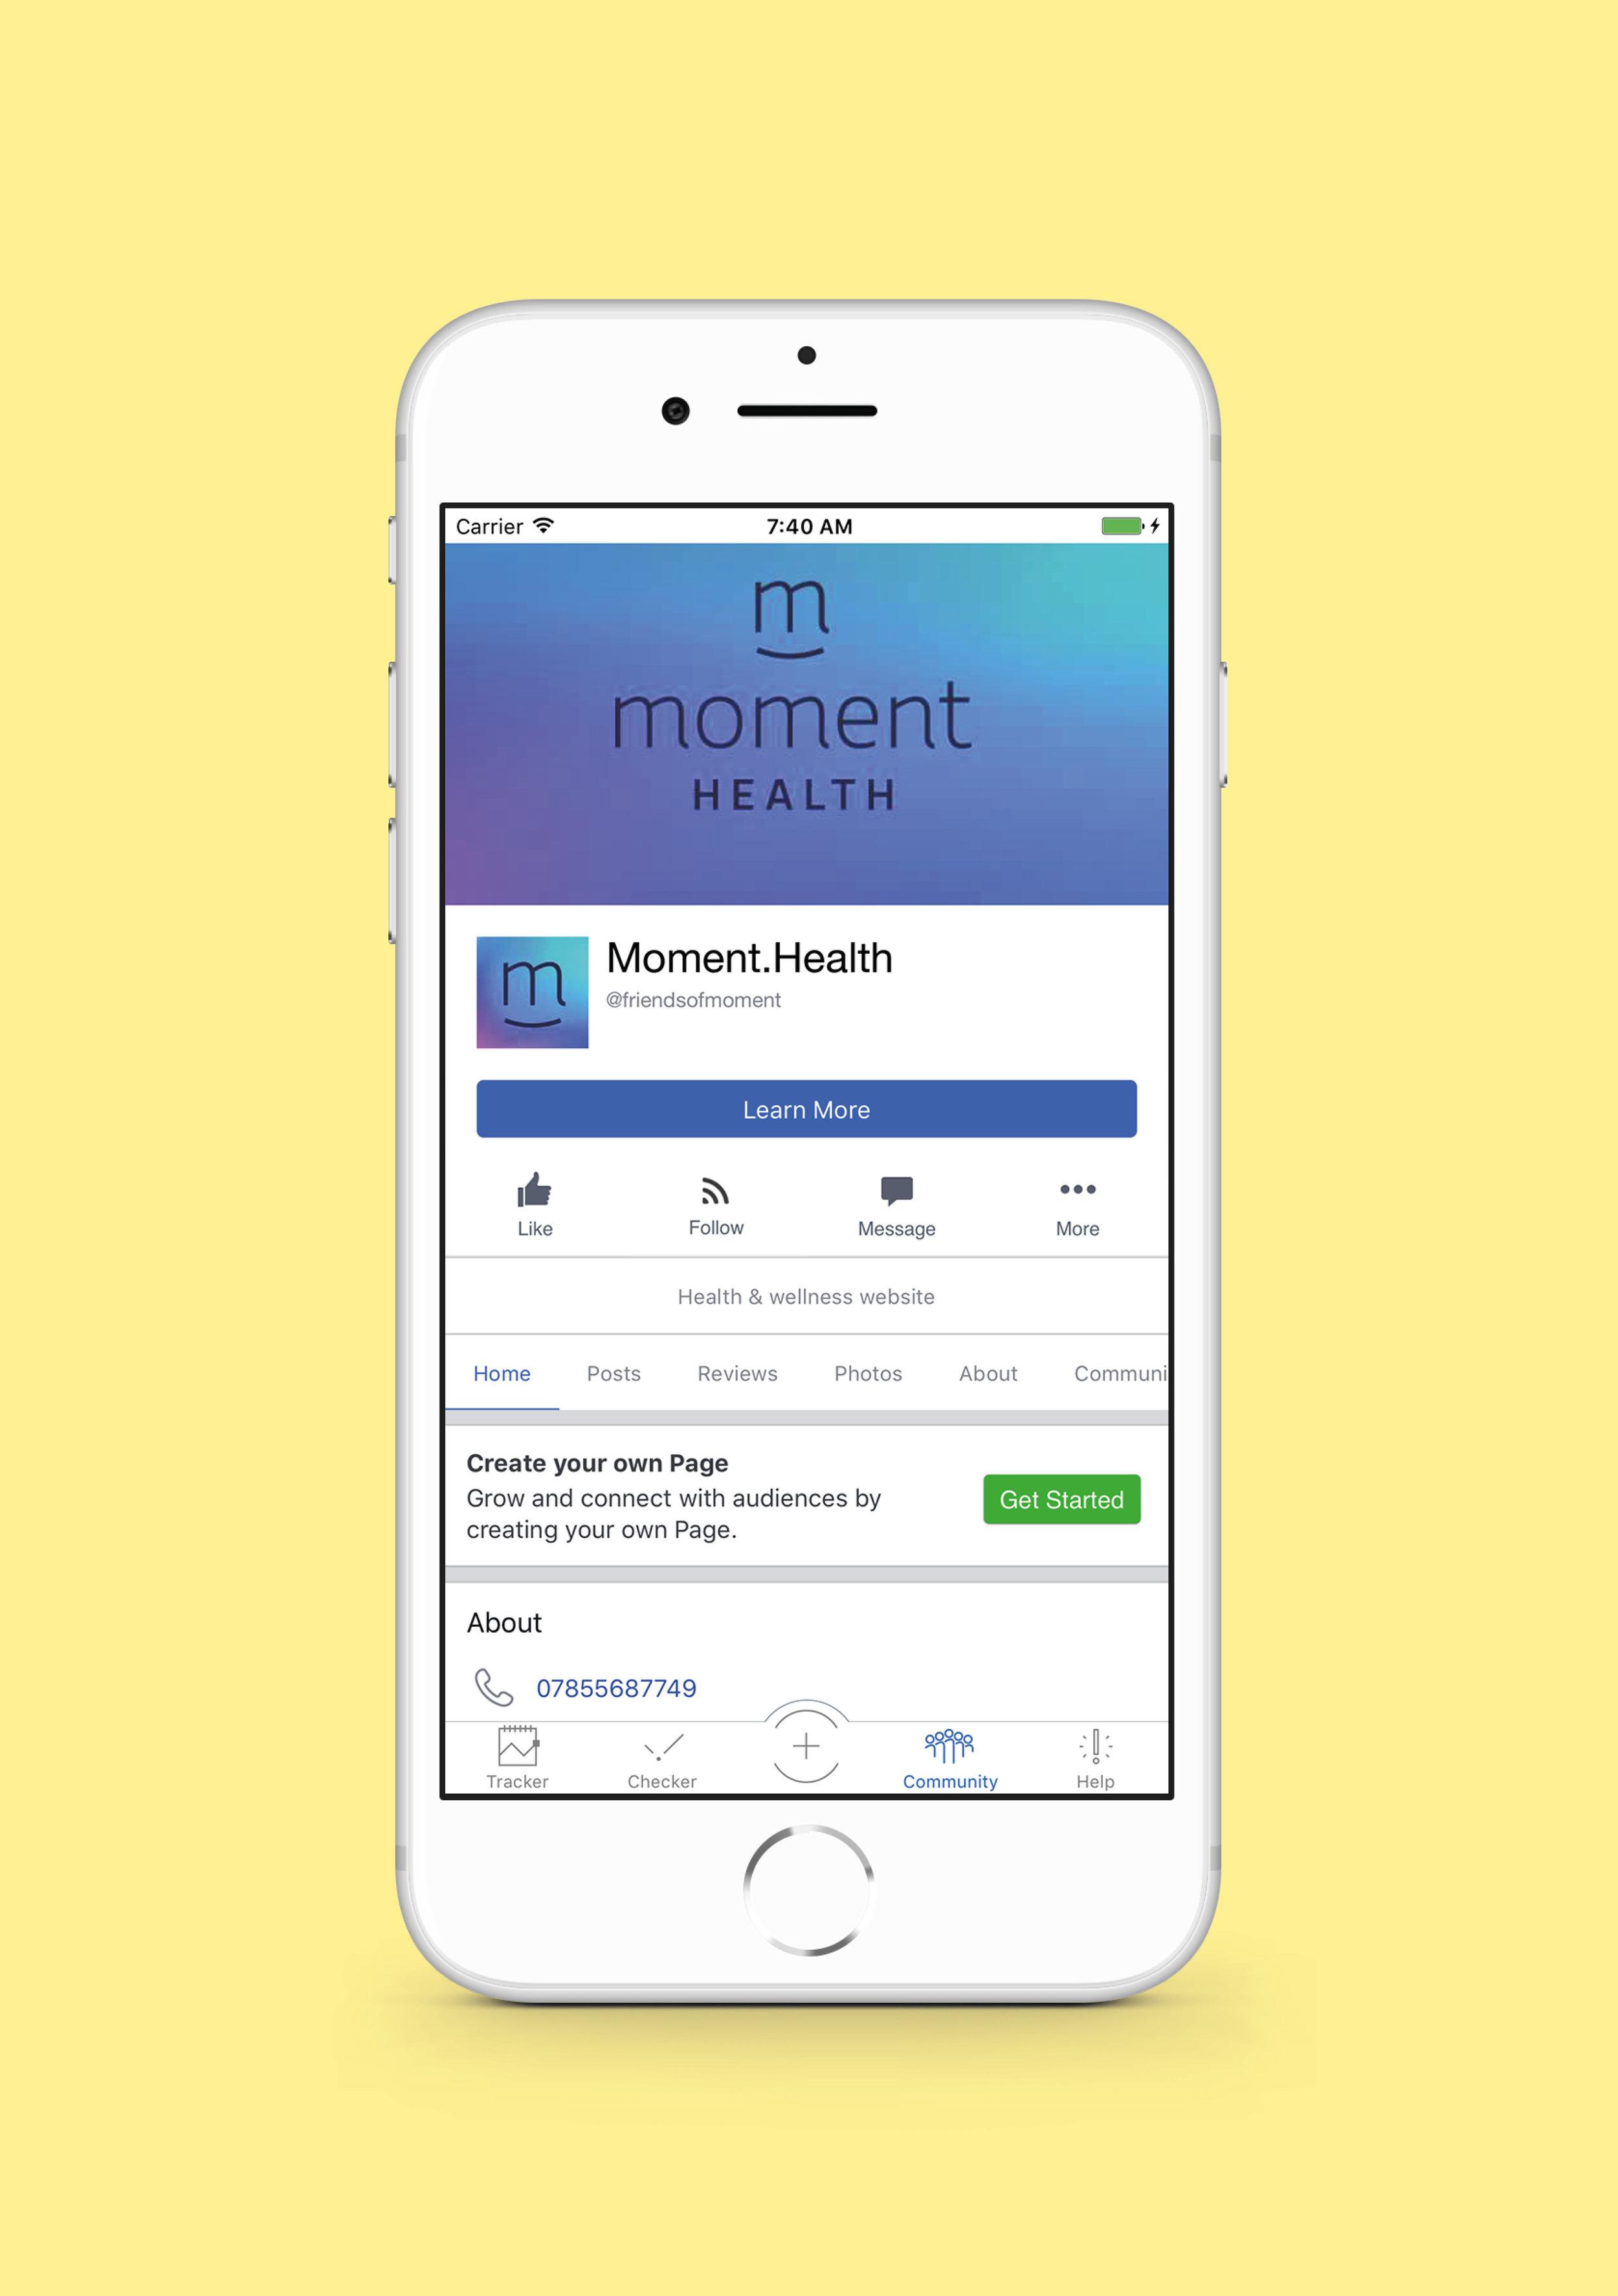 moment-health-app-screen-visuals-5.jpg